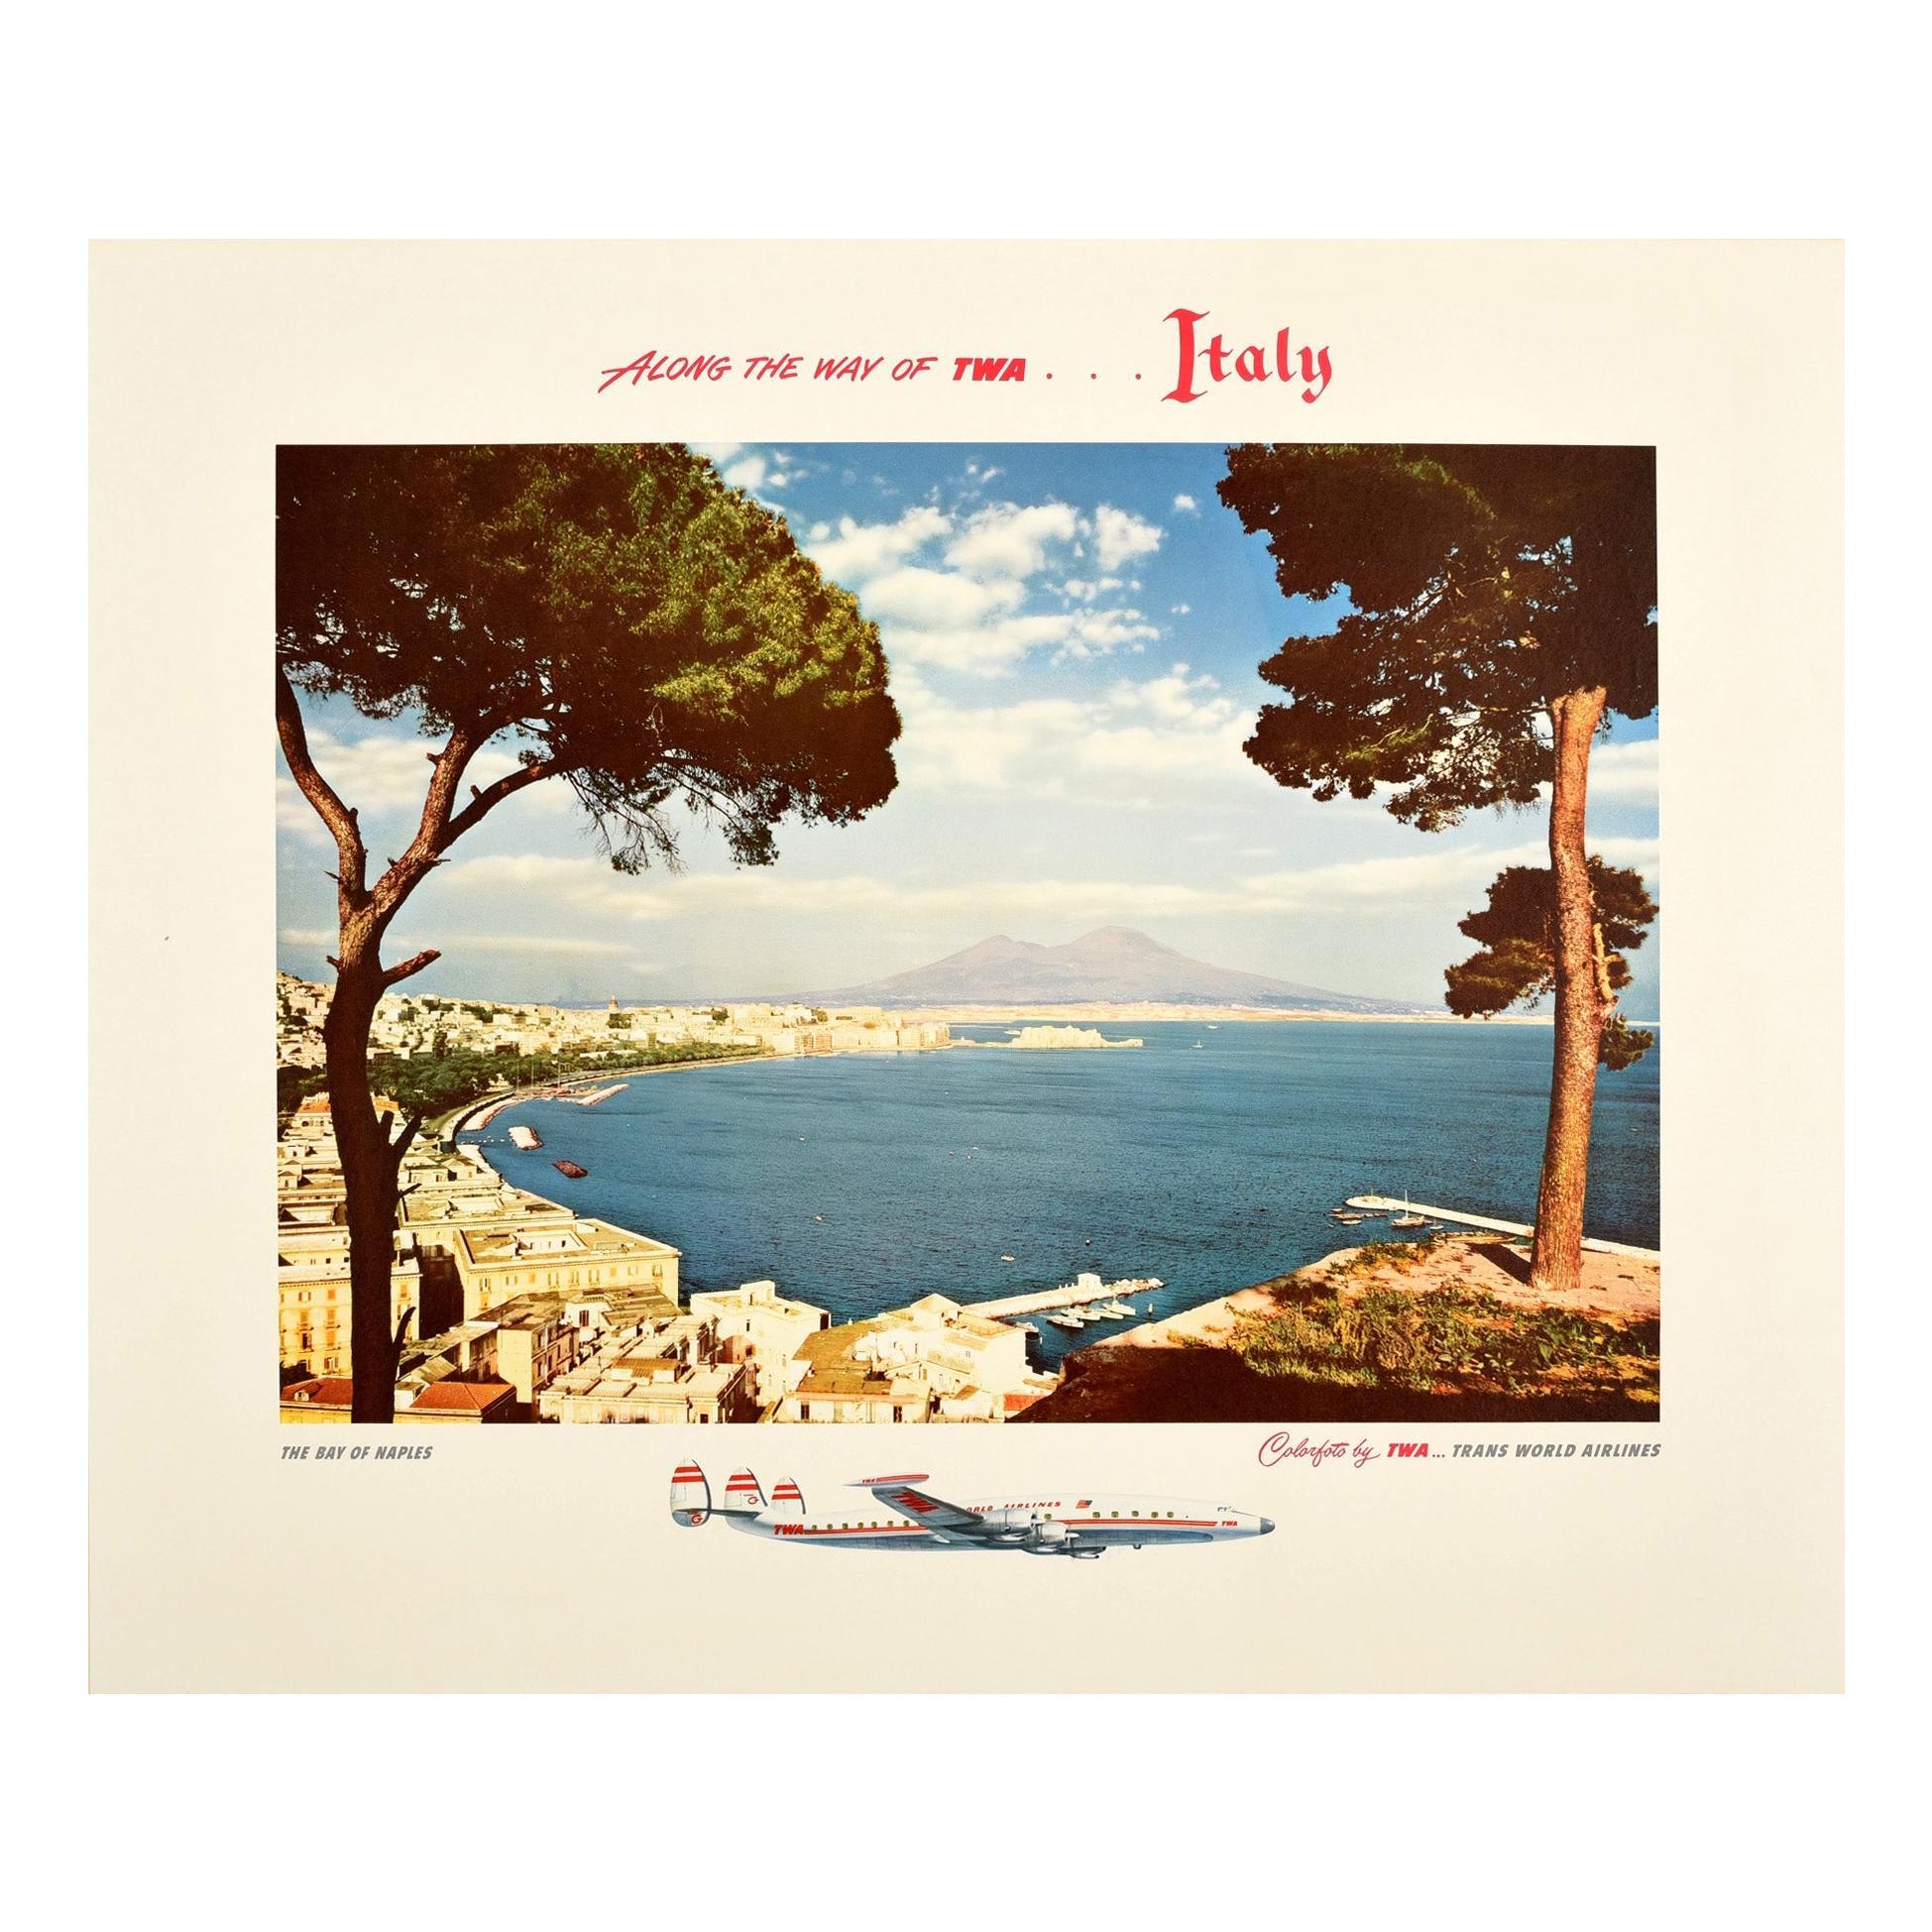 Original Vintage Air Travel Poster TWA Italy Bay Of Naples Mount Vesuvius Coast